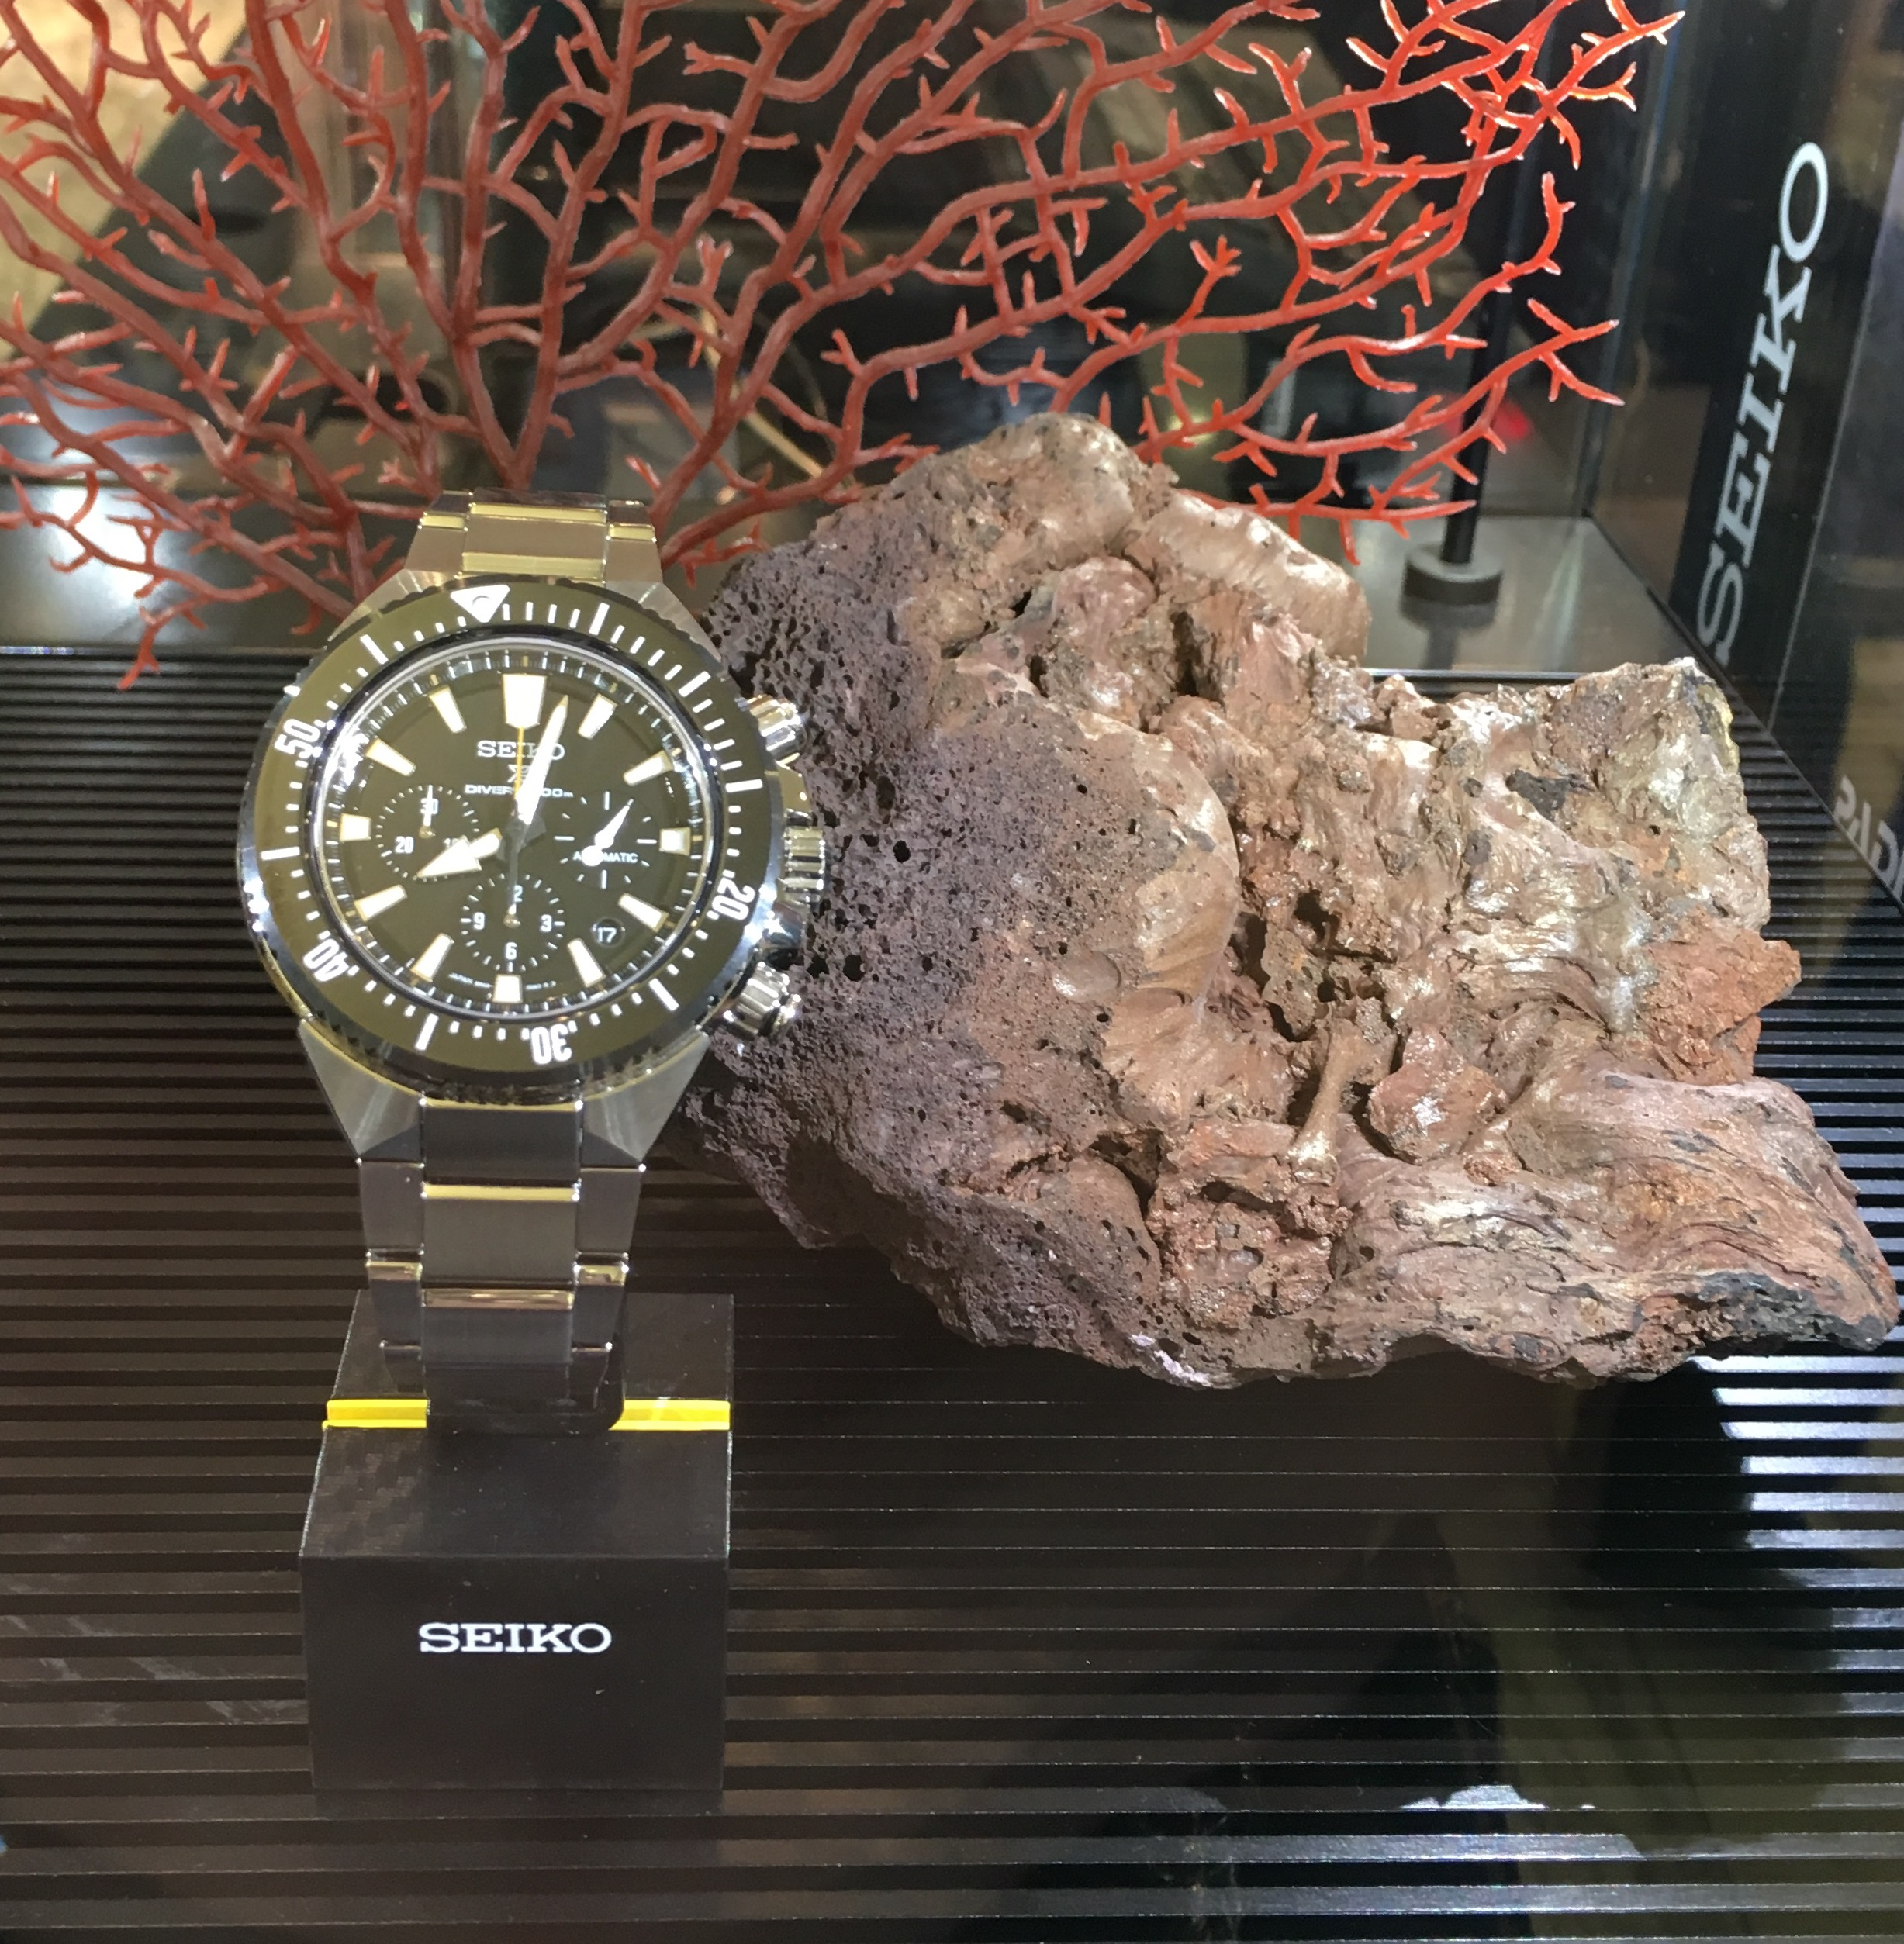 Seiko Prosper Diver's watches